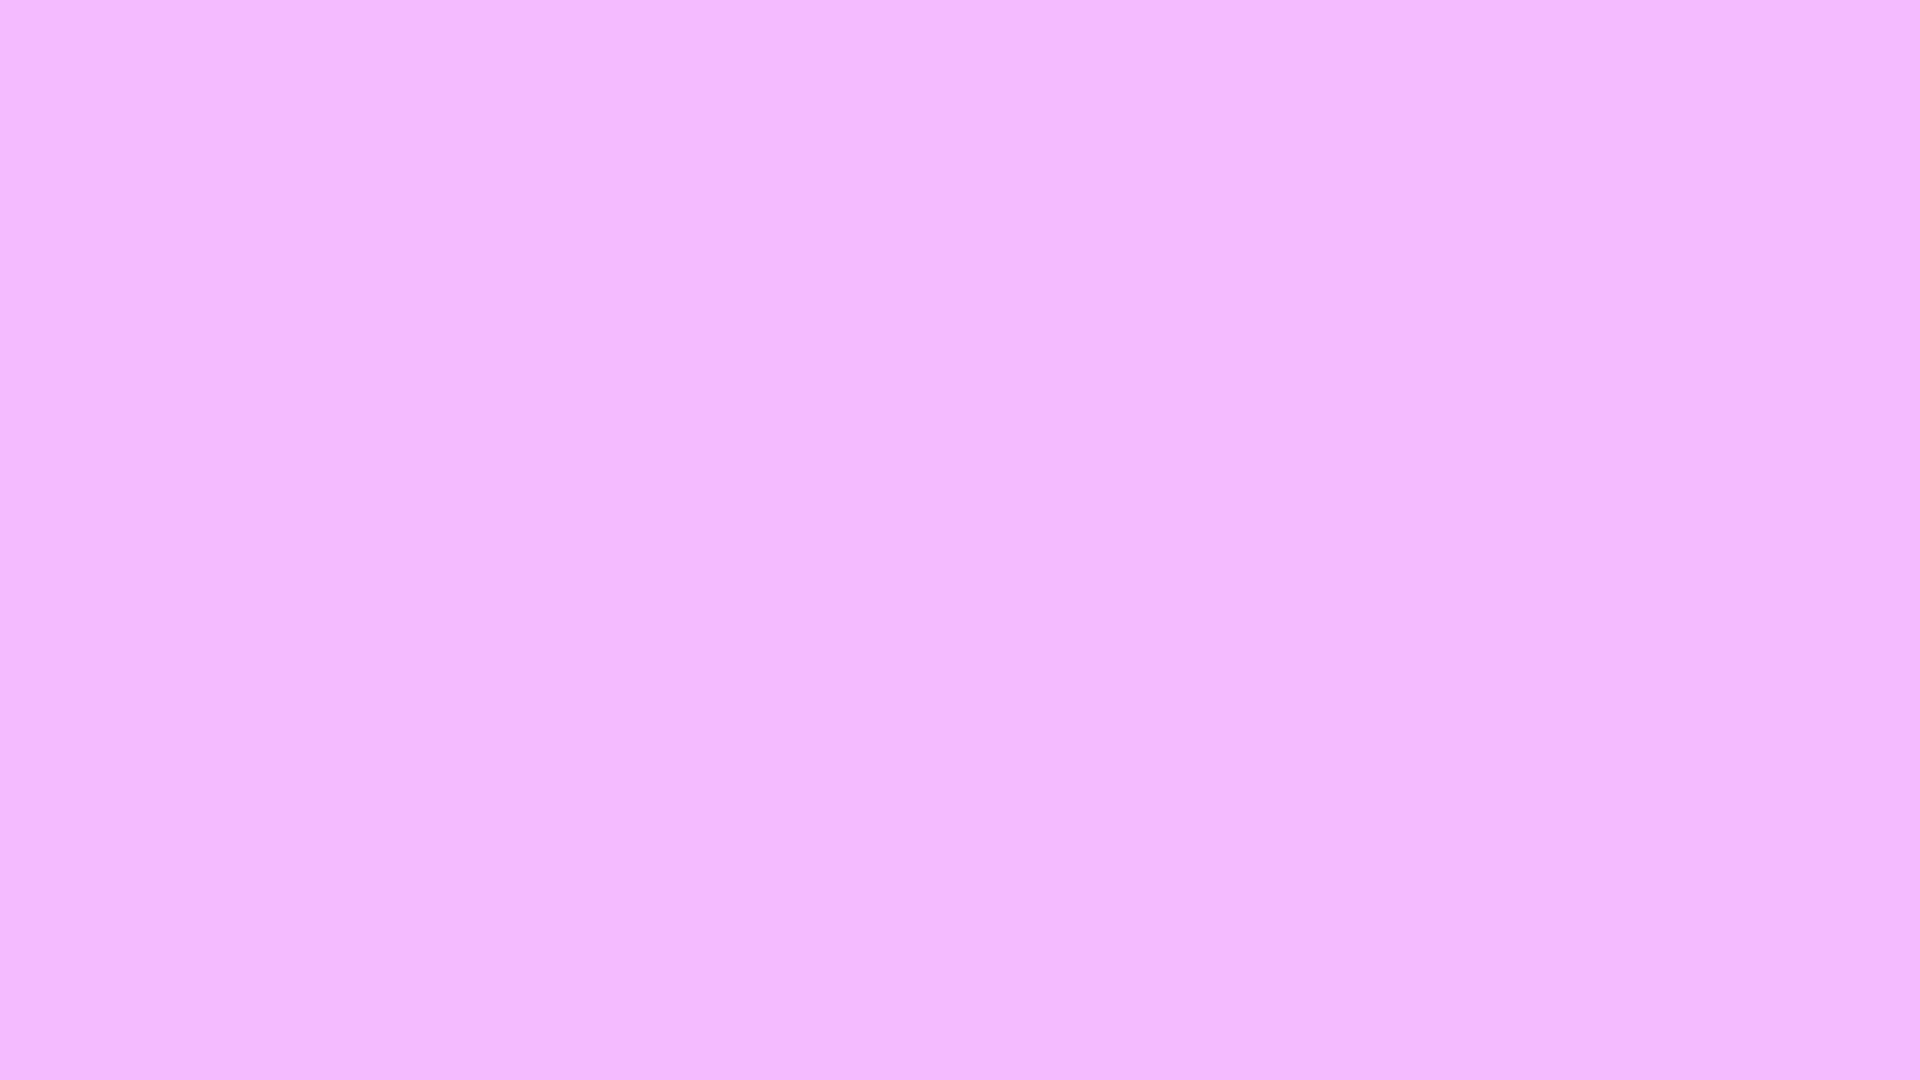 Electric Lavender Solid Color Background